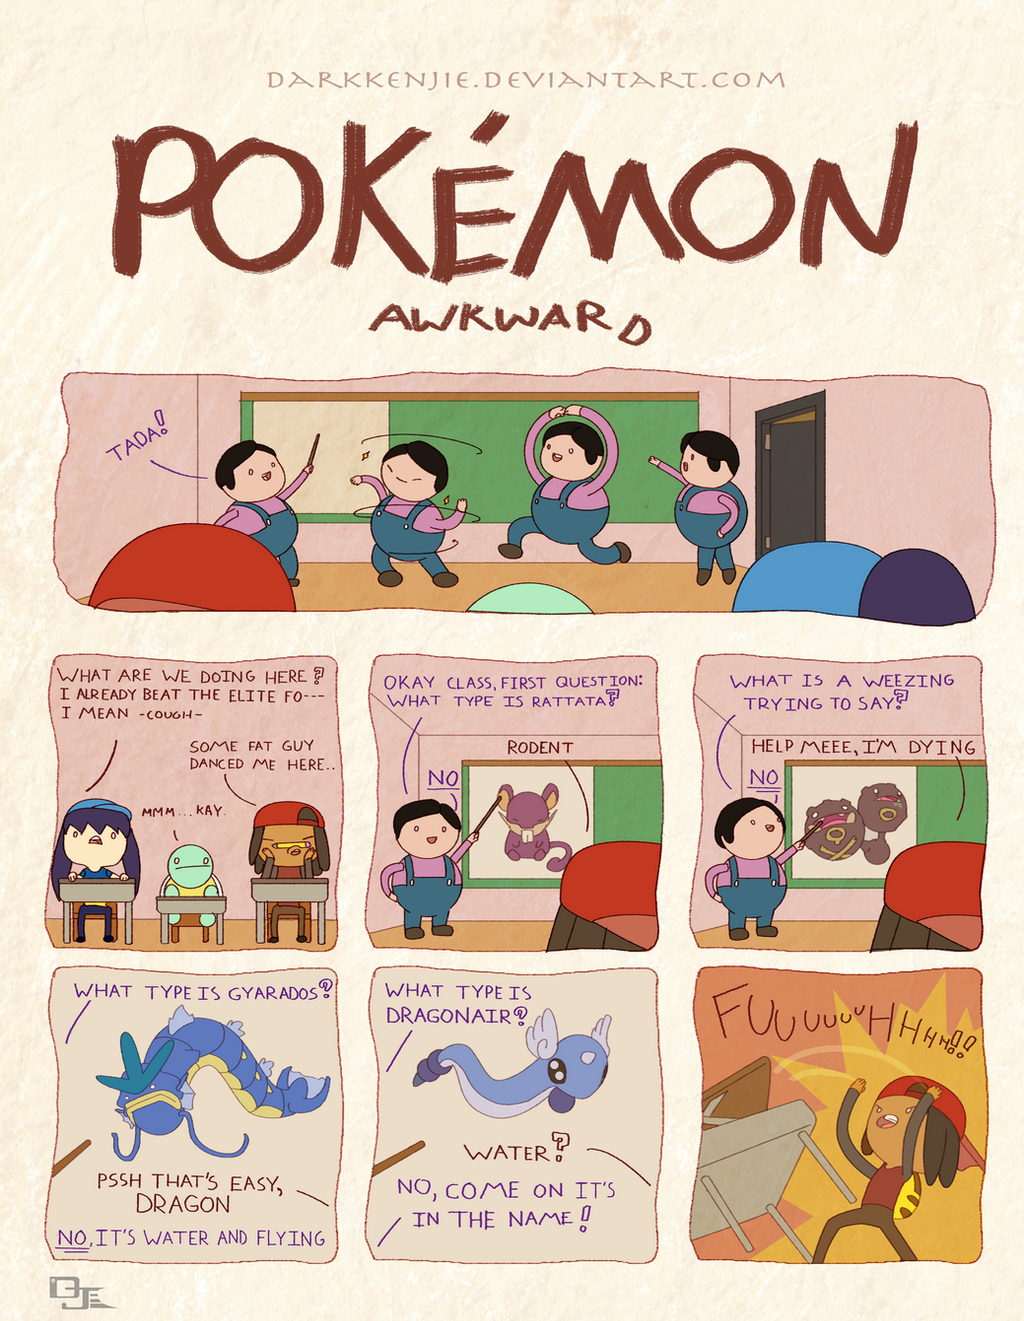 Pokemon Awkward: Flipping Finals by DarkKenjie